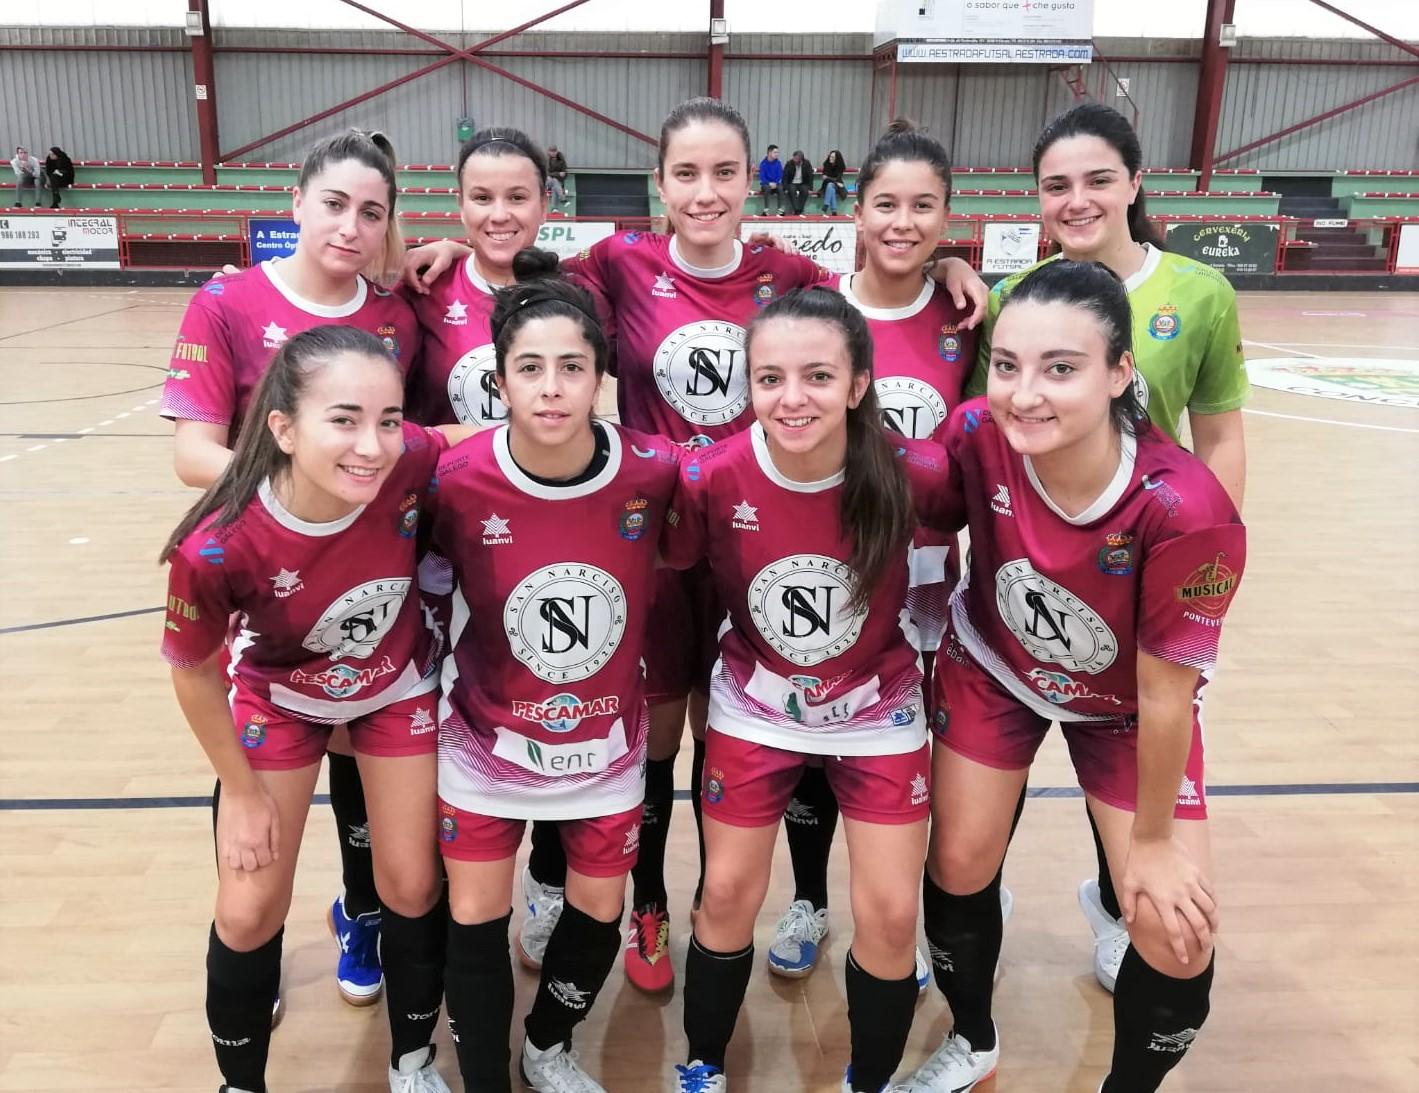 Senior Femenino, Cierre de Temporada 19-20